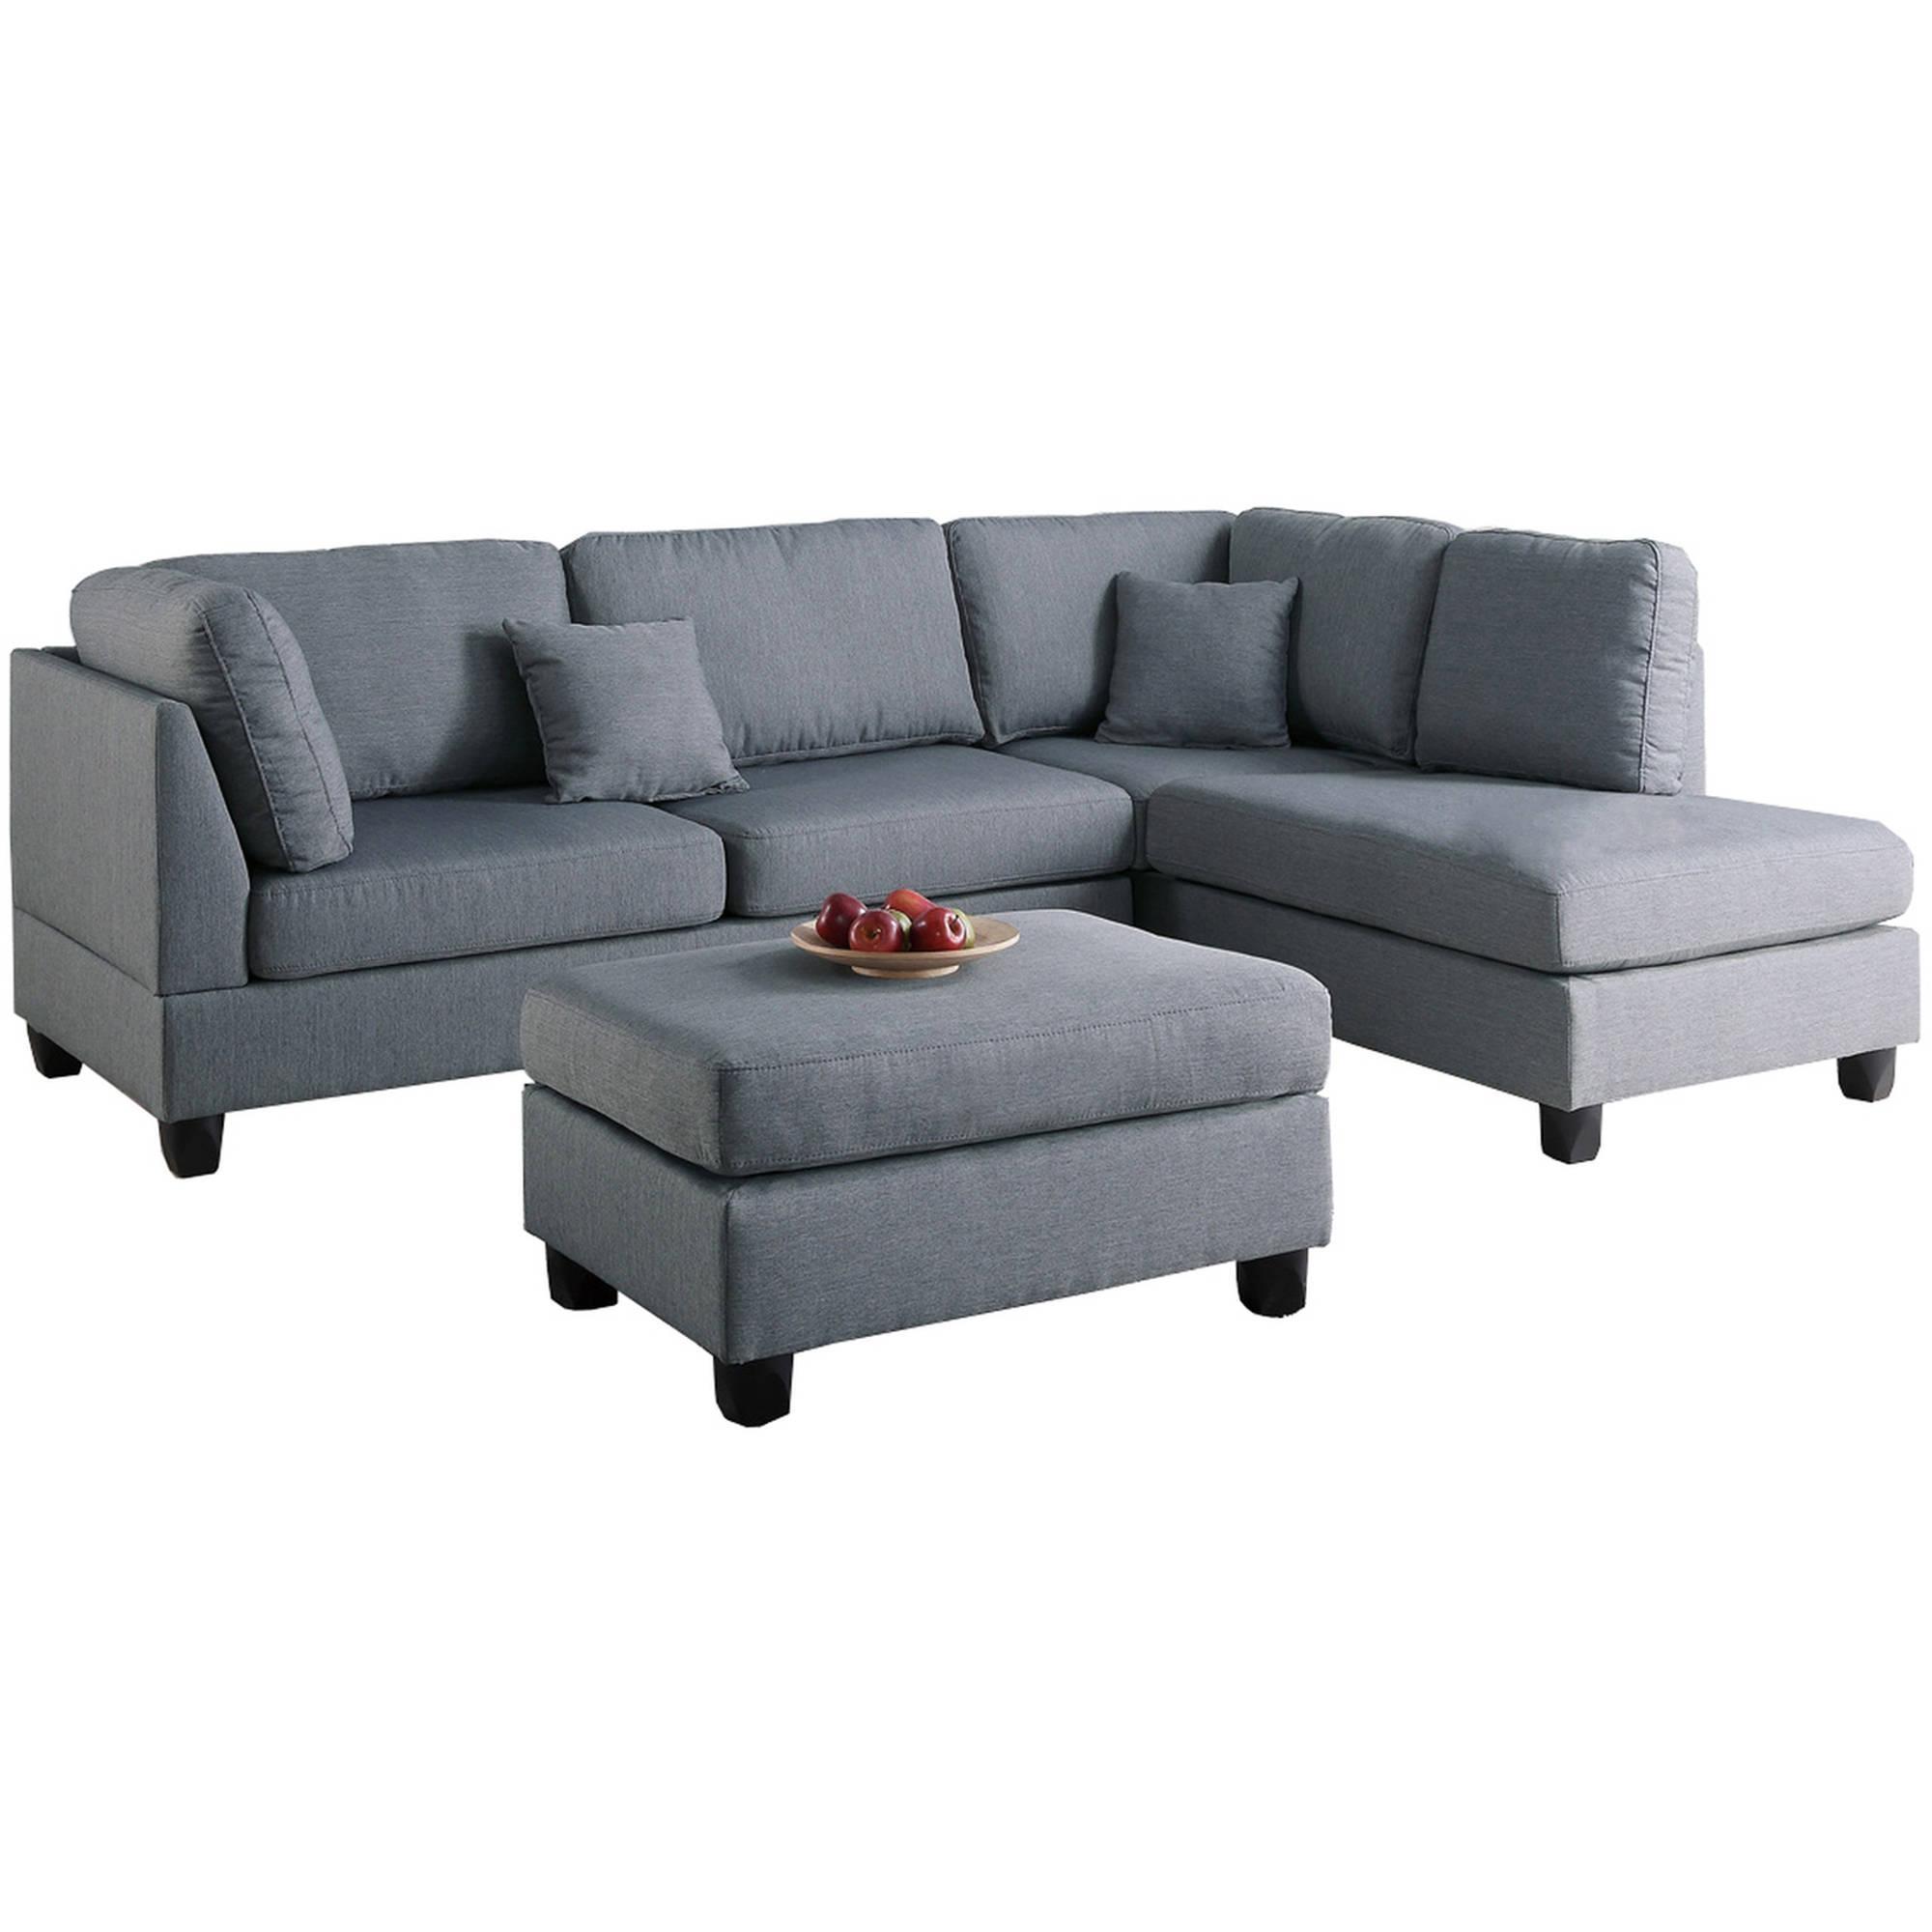 Furniture: Walmart Sofa Sleeper | Simmons Sofa | Sofas Under 300 Regarding Simmons Chaise Sofa (View 14 of 20)